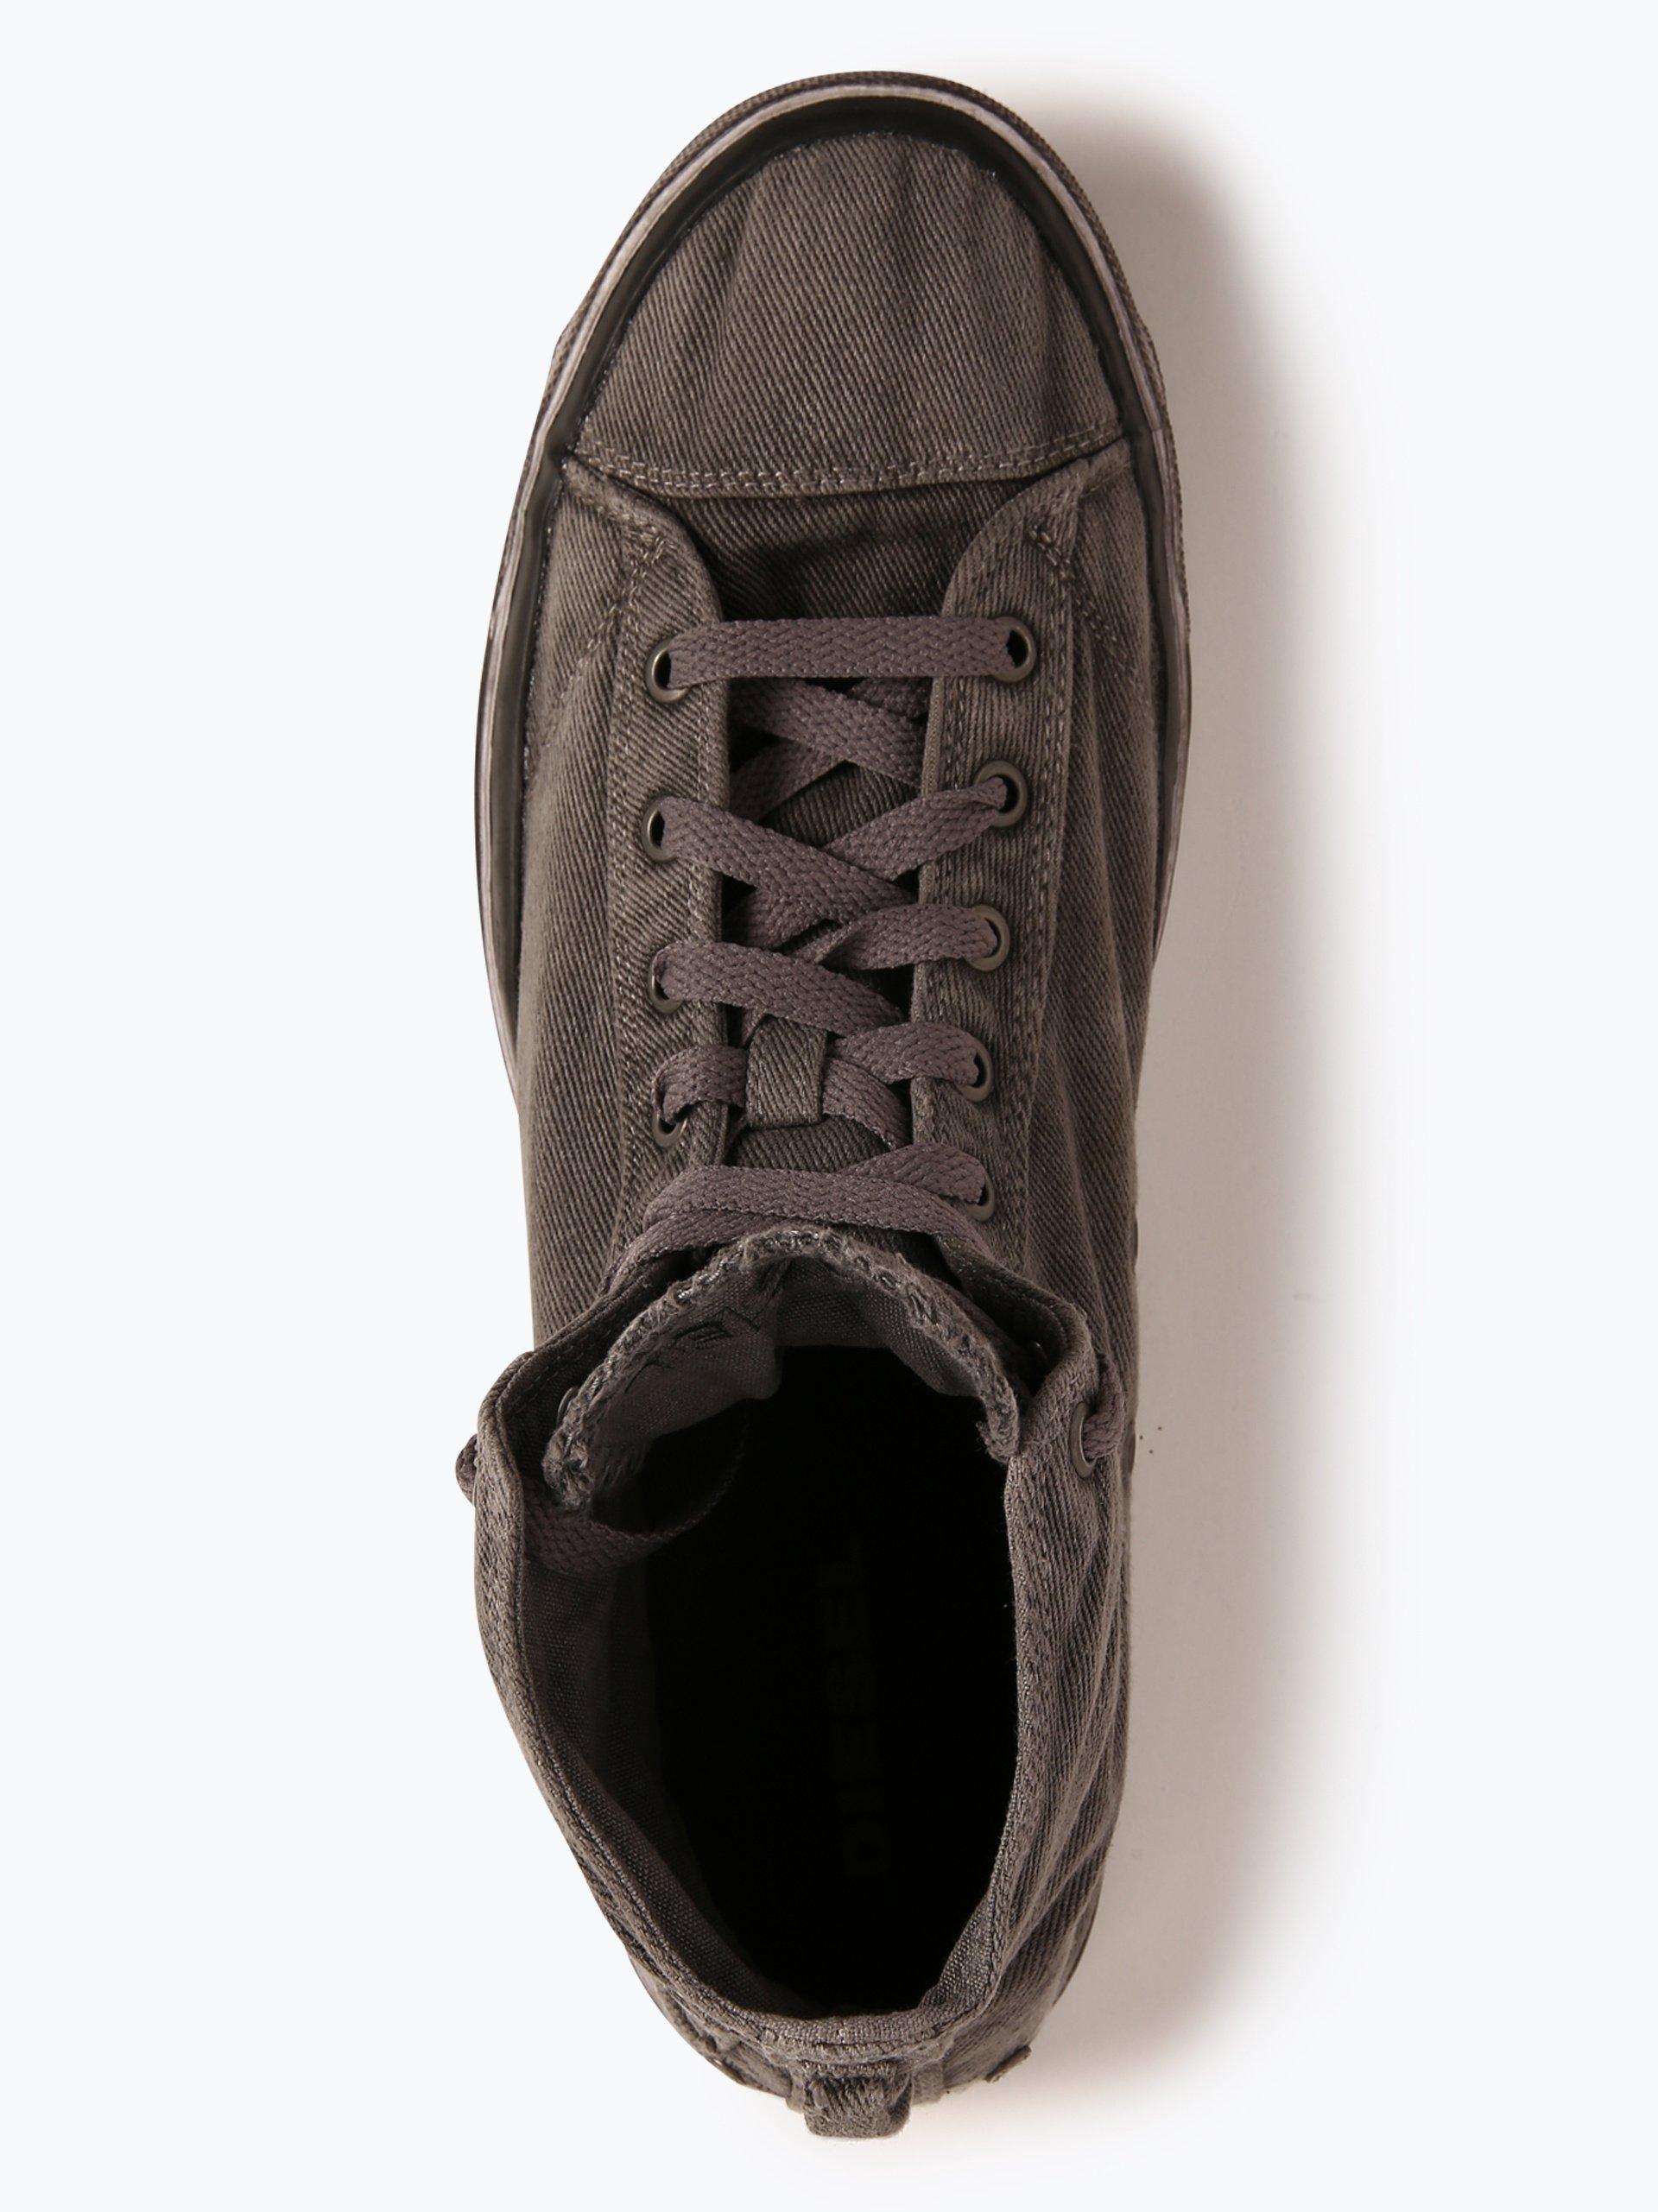 diesel herren sneaker exposure i 2 online kaufen peek und cloppenburg de. Black Bedroom Furniture Sets. Home Design Ideas